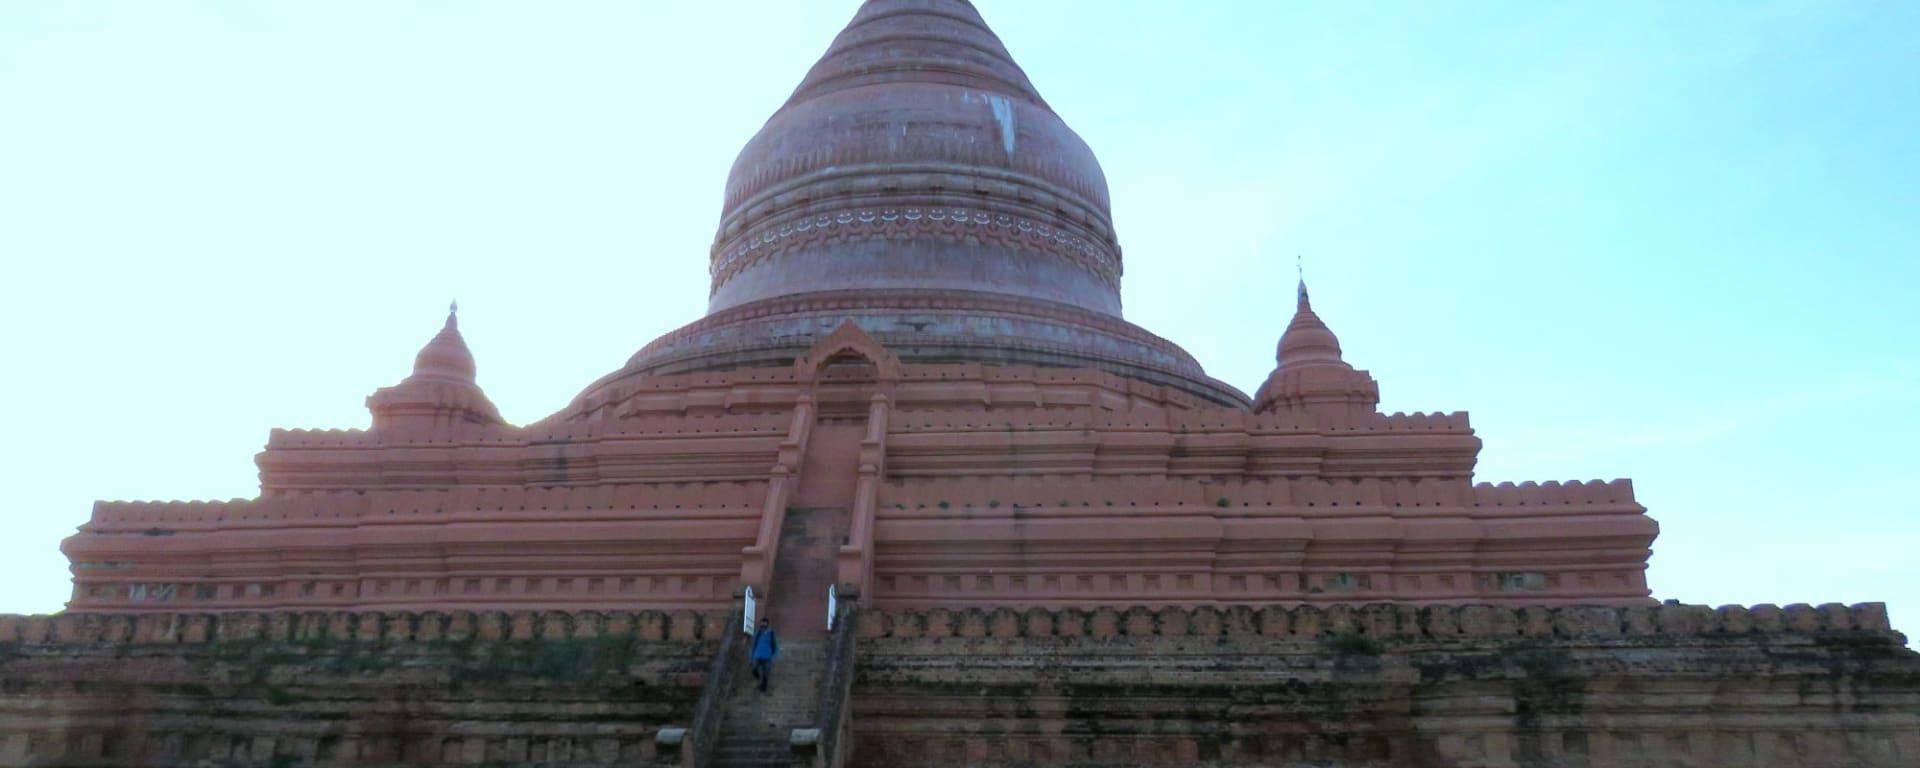 Ursprüngliches Dorfleben am Dohtawaddy Fluss in Mandalay: Shwe Zi Gon Pagoda